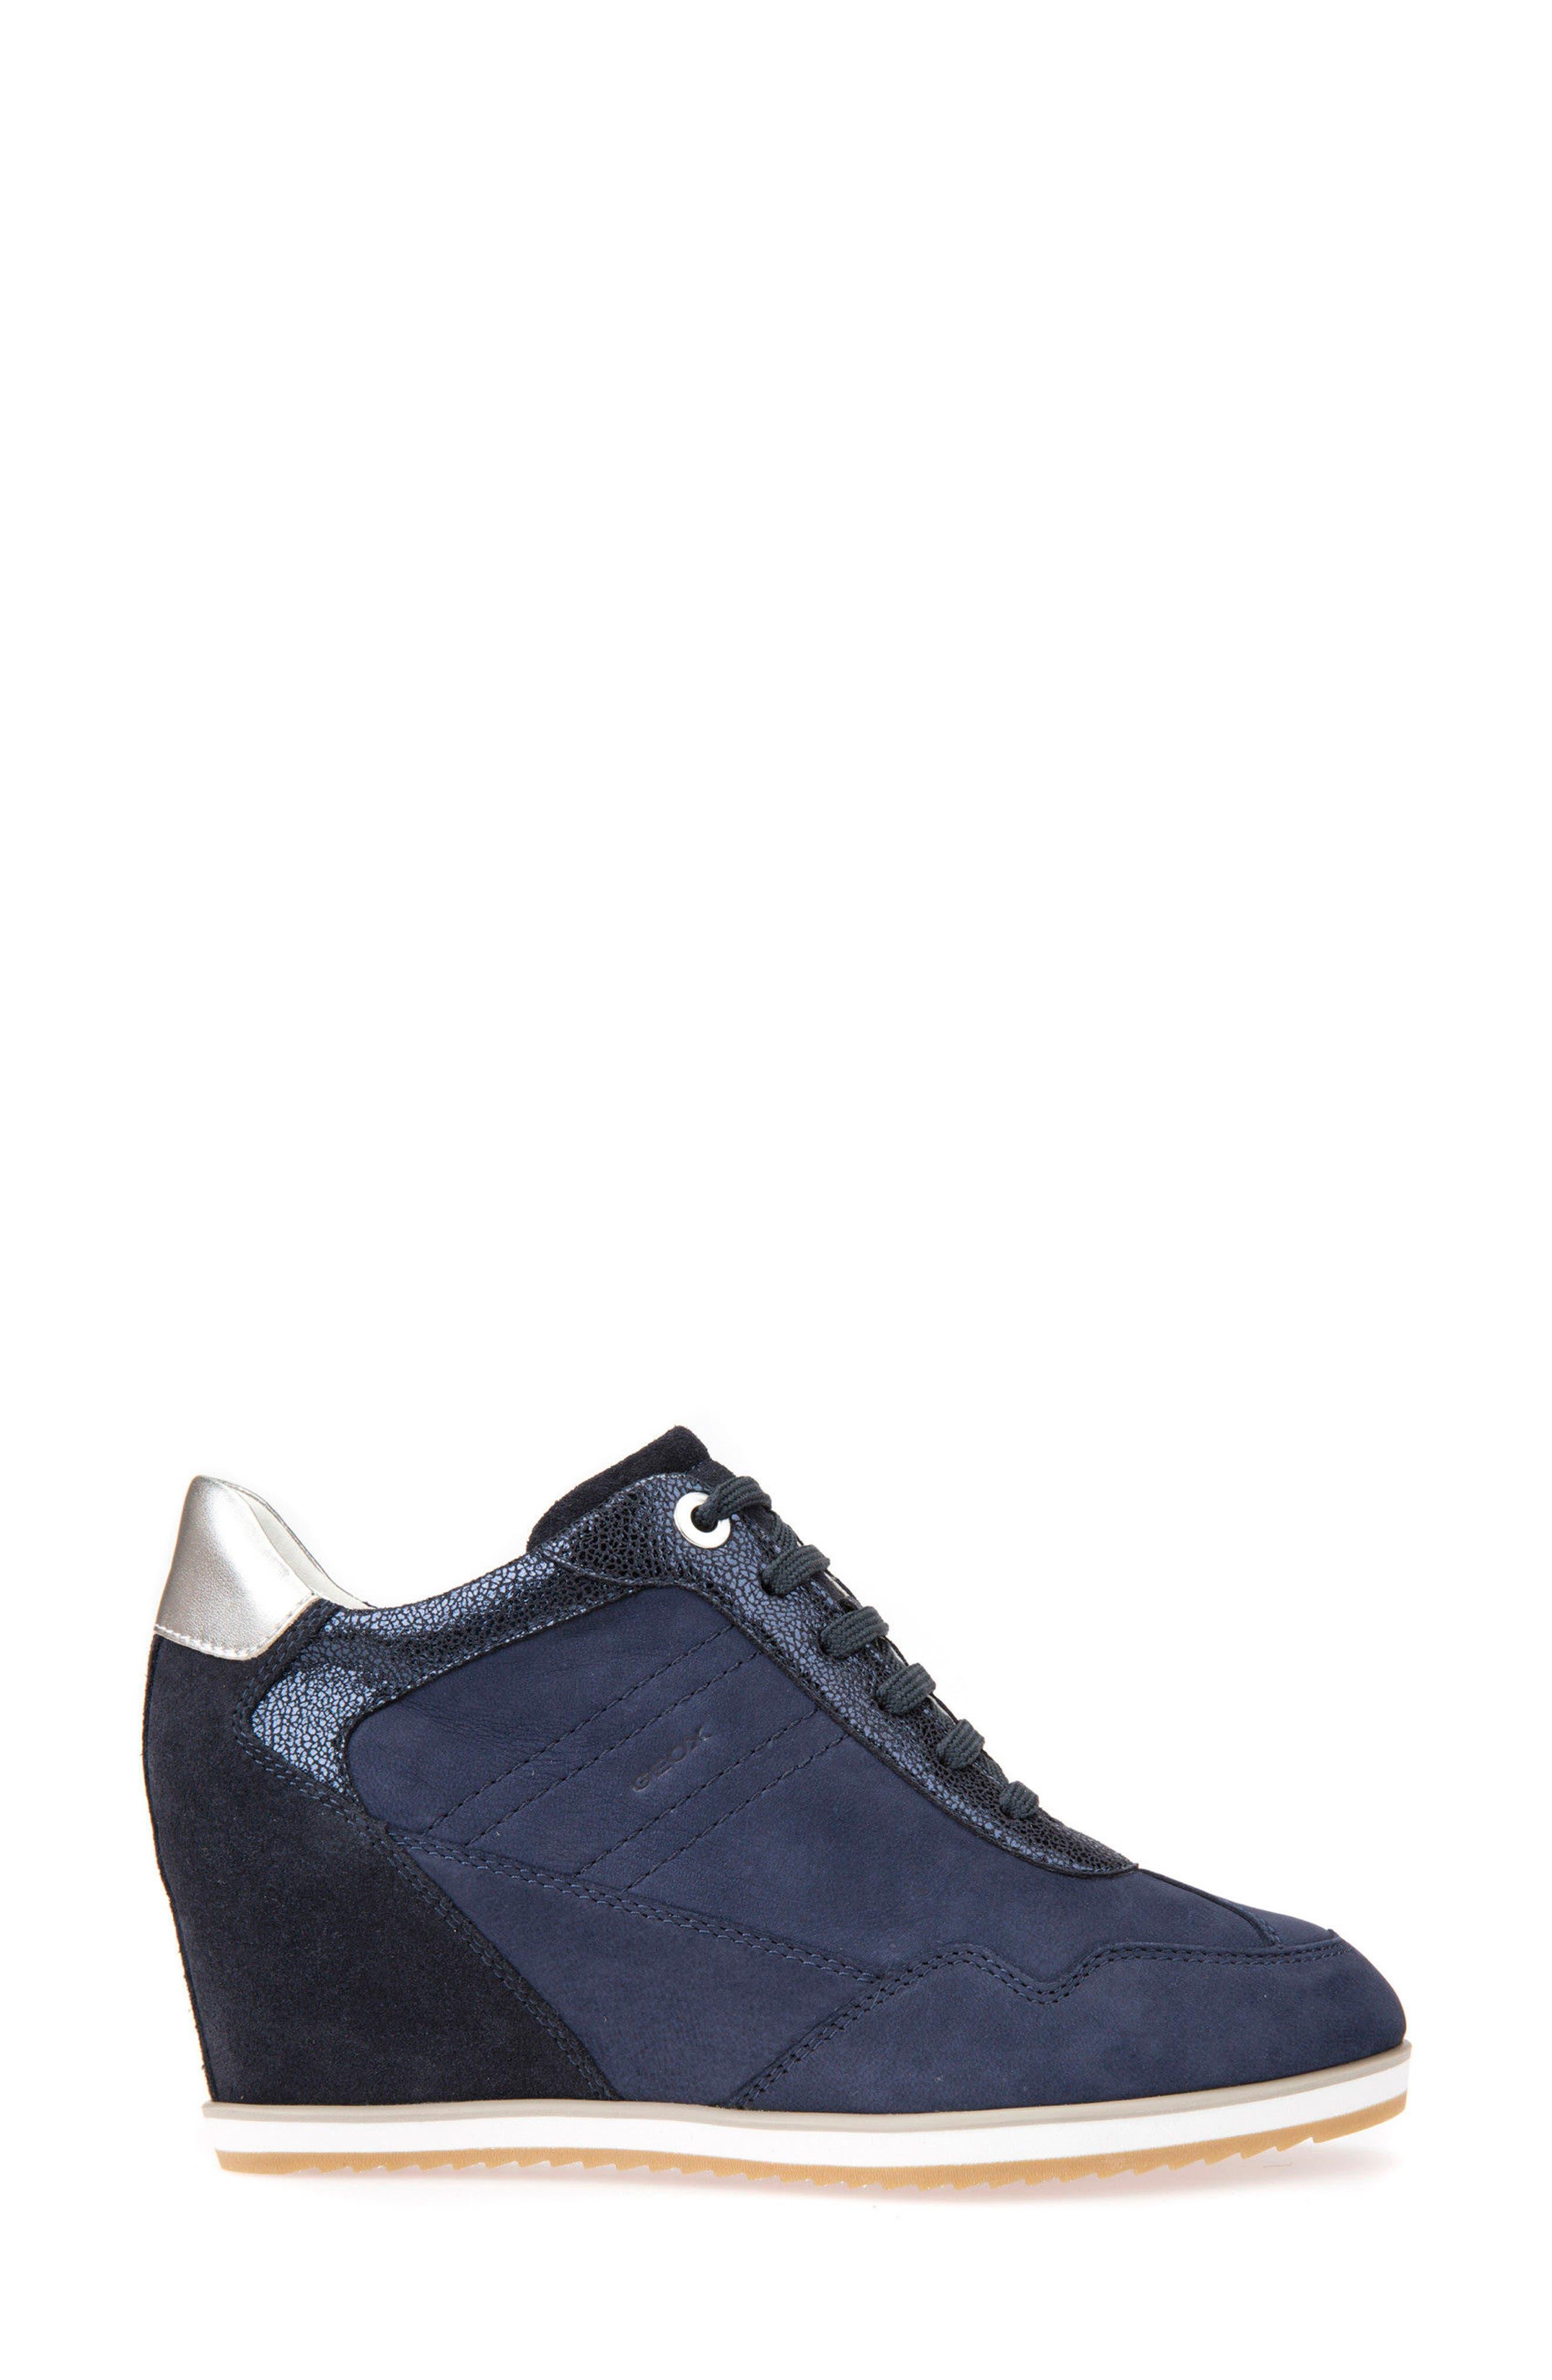 Alternate Image 3  - Geox Illusion 34 Wedge Sneaker (Women)